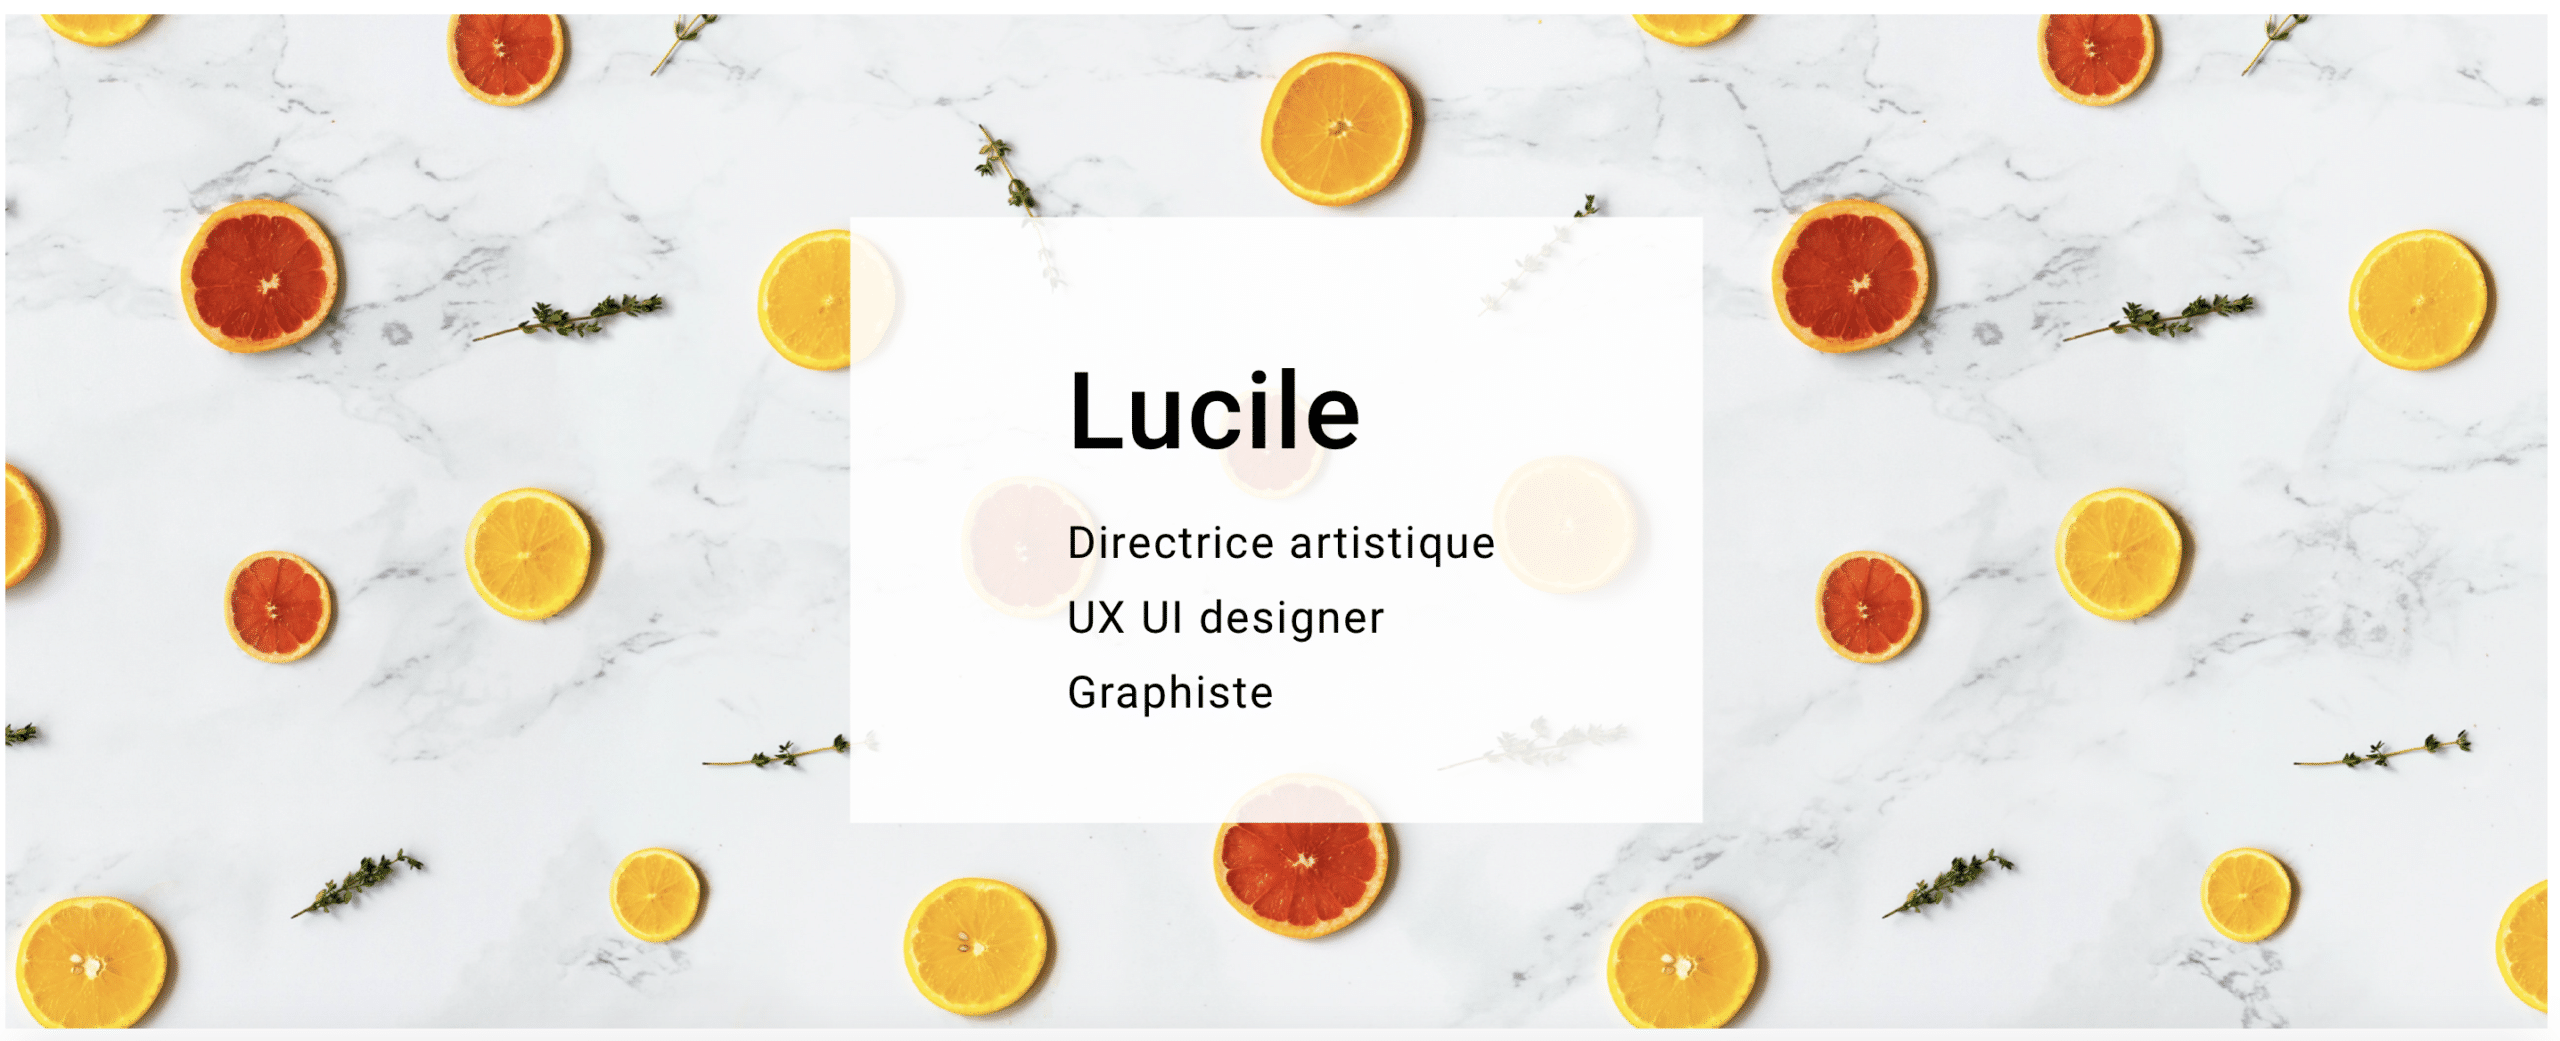 LucileEscaffre - Directrice artistique - UX UI Designer - Graphiste